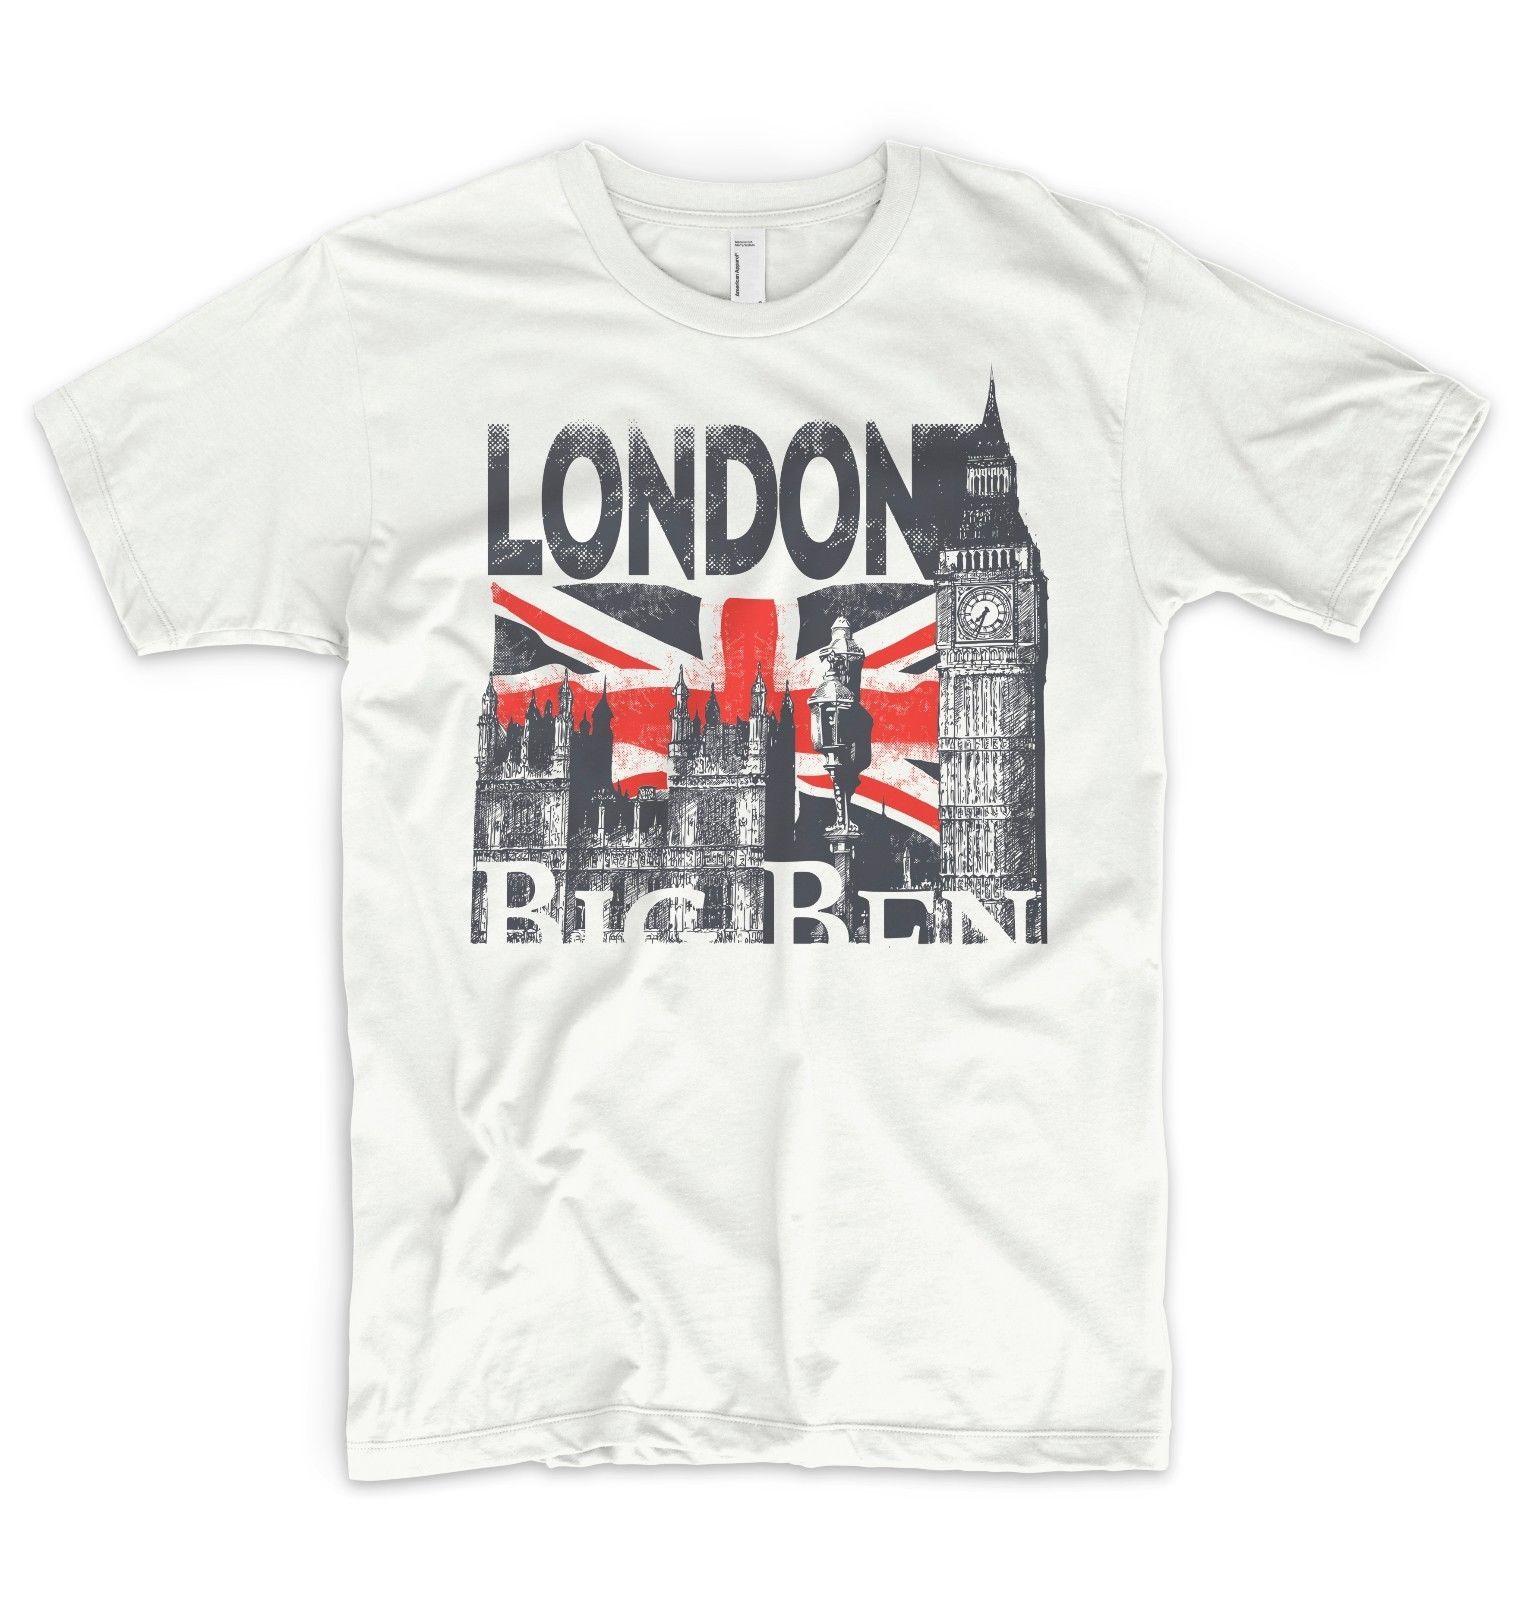 fbd98e04d London Big Ben T Shirt I Love United Kingdom Great Britain England Trip  Holiday Funny Unisex Gift Vintage Tee Shirts Family T Shirts From  Topclassa, ...